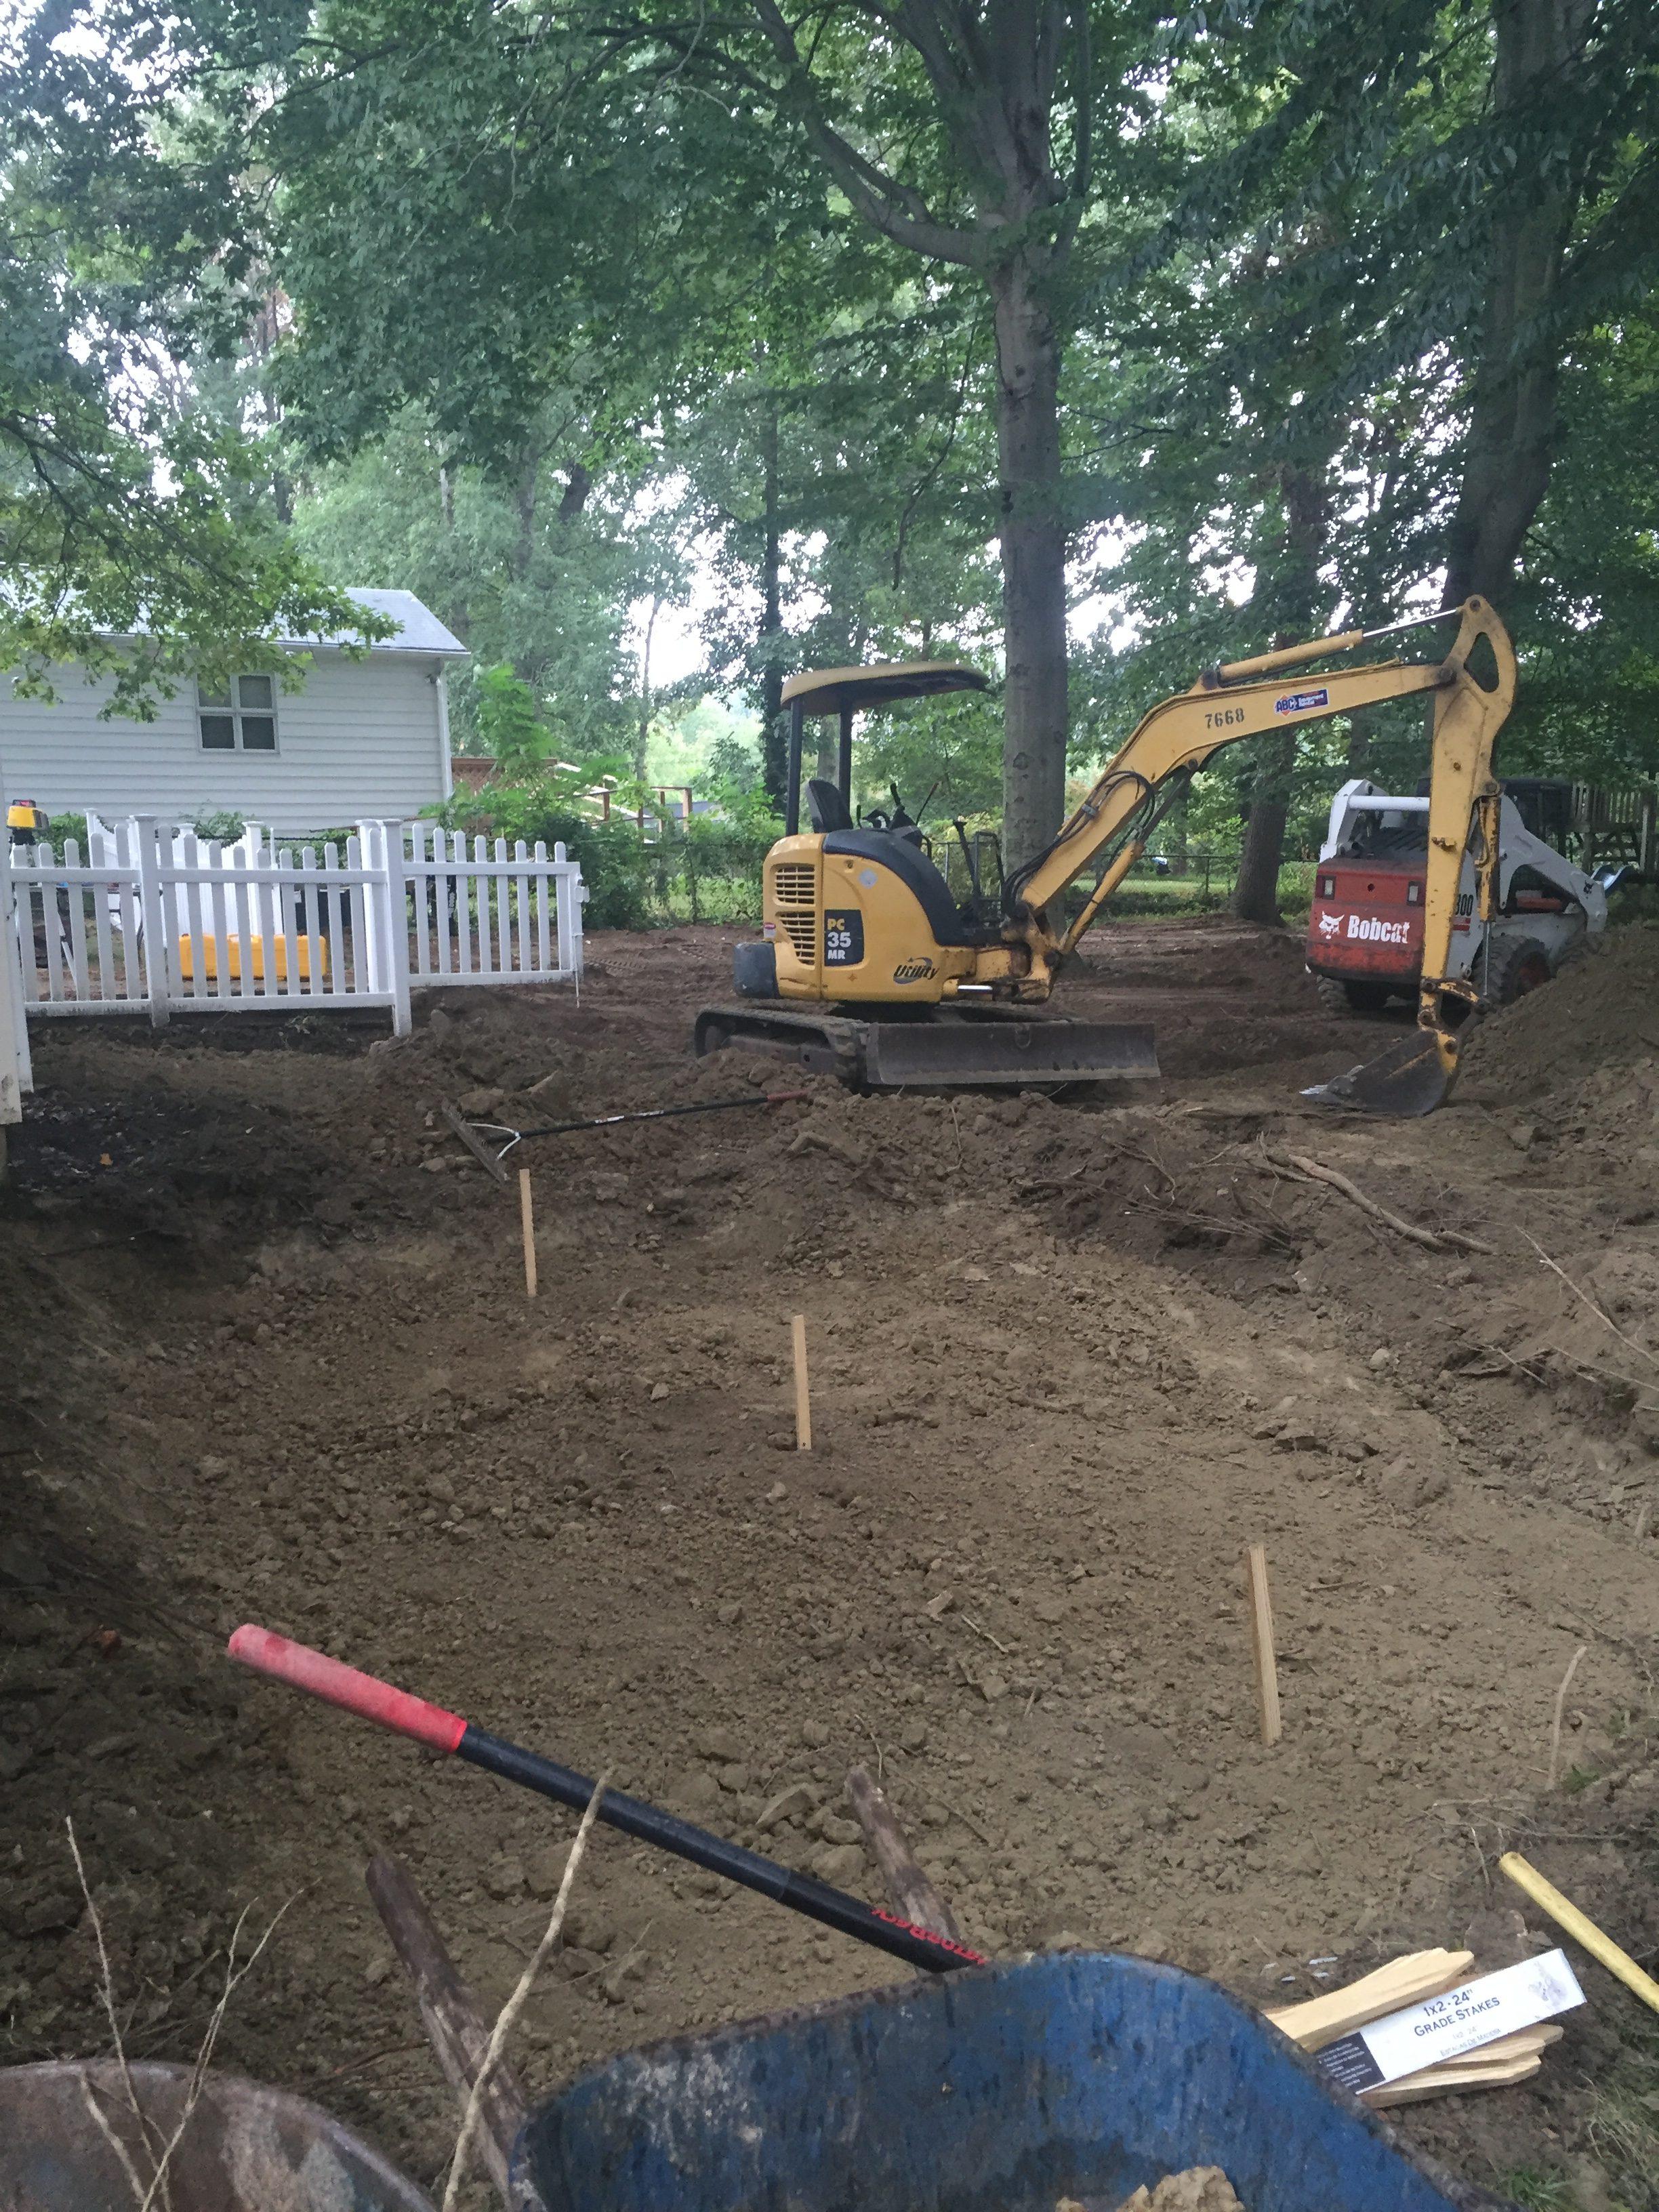 Grading Amp Excavation Services In Catonsville Ellicott